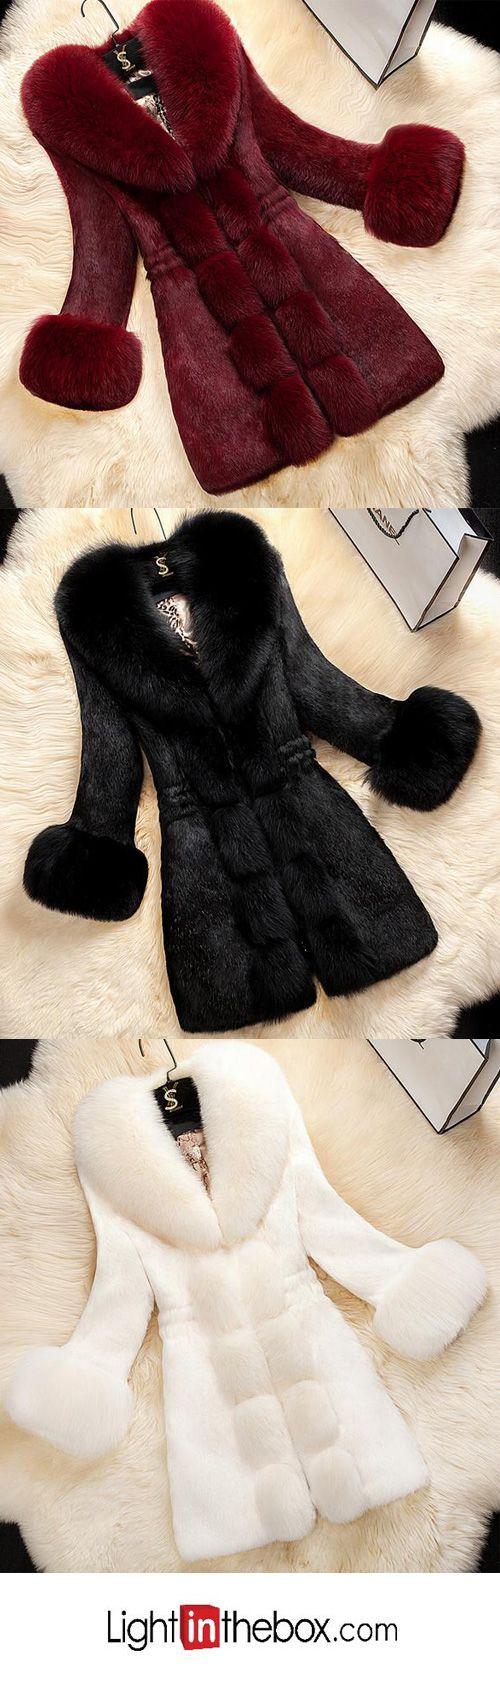 Women's New Year Festival Elegant & Luxurious Winter Fur Coat